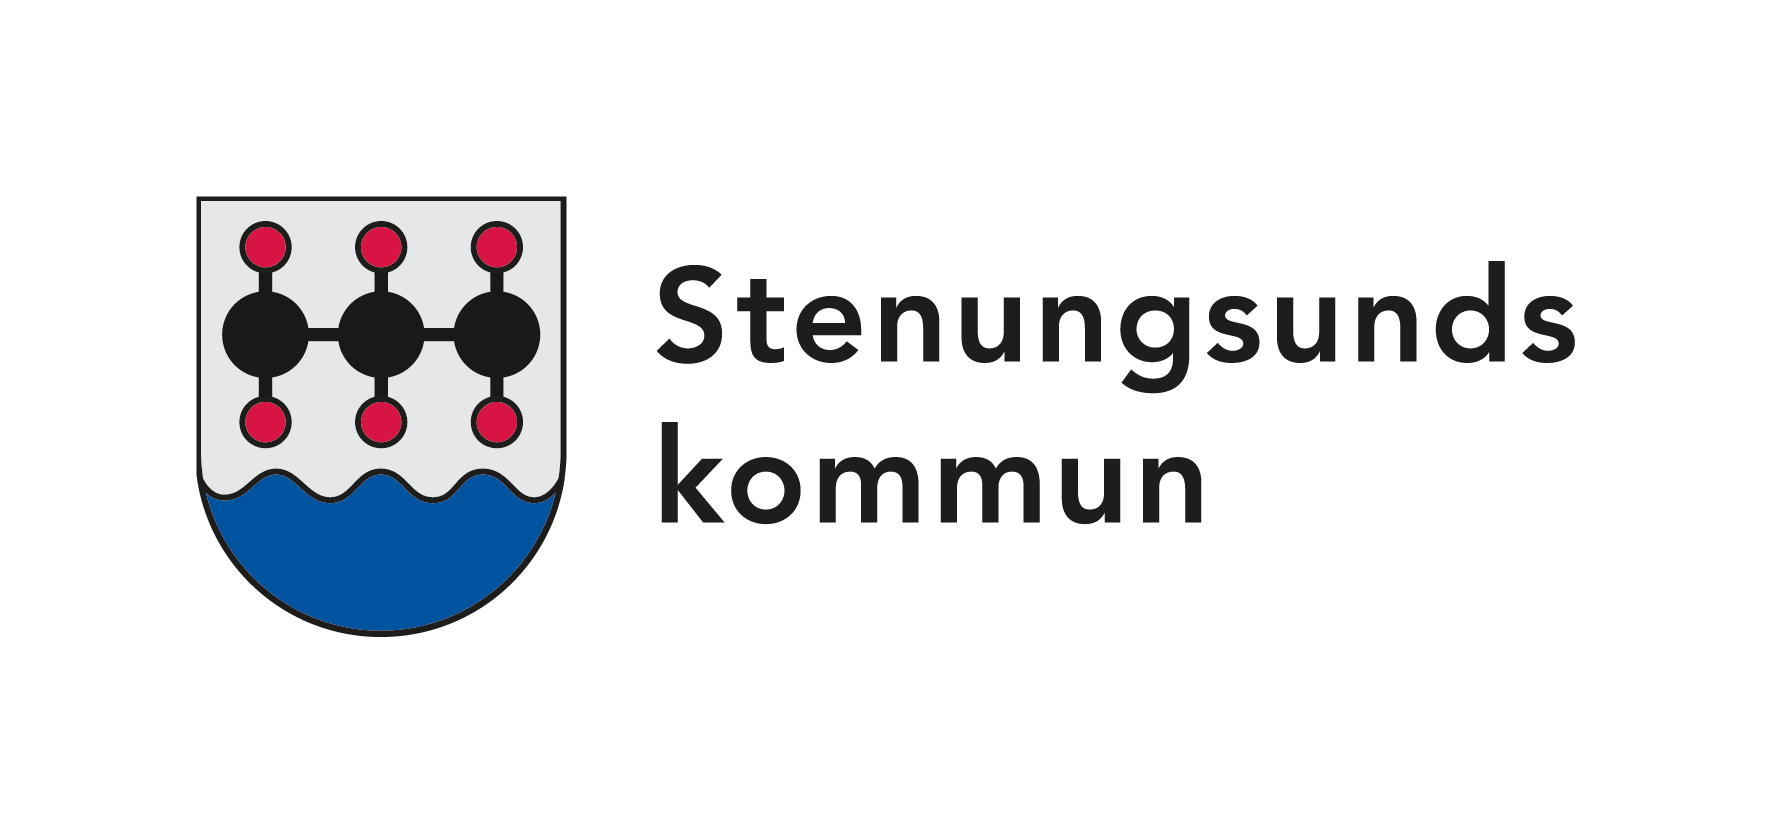 Stenungsunds kommun.png